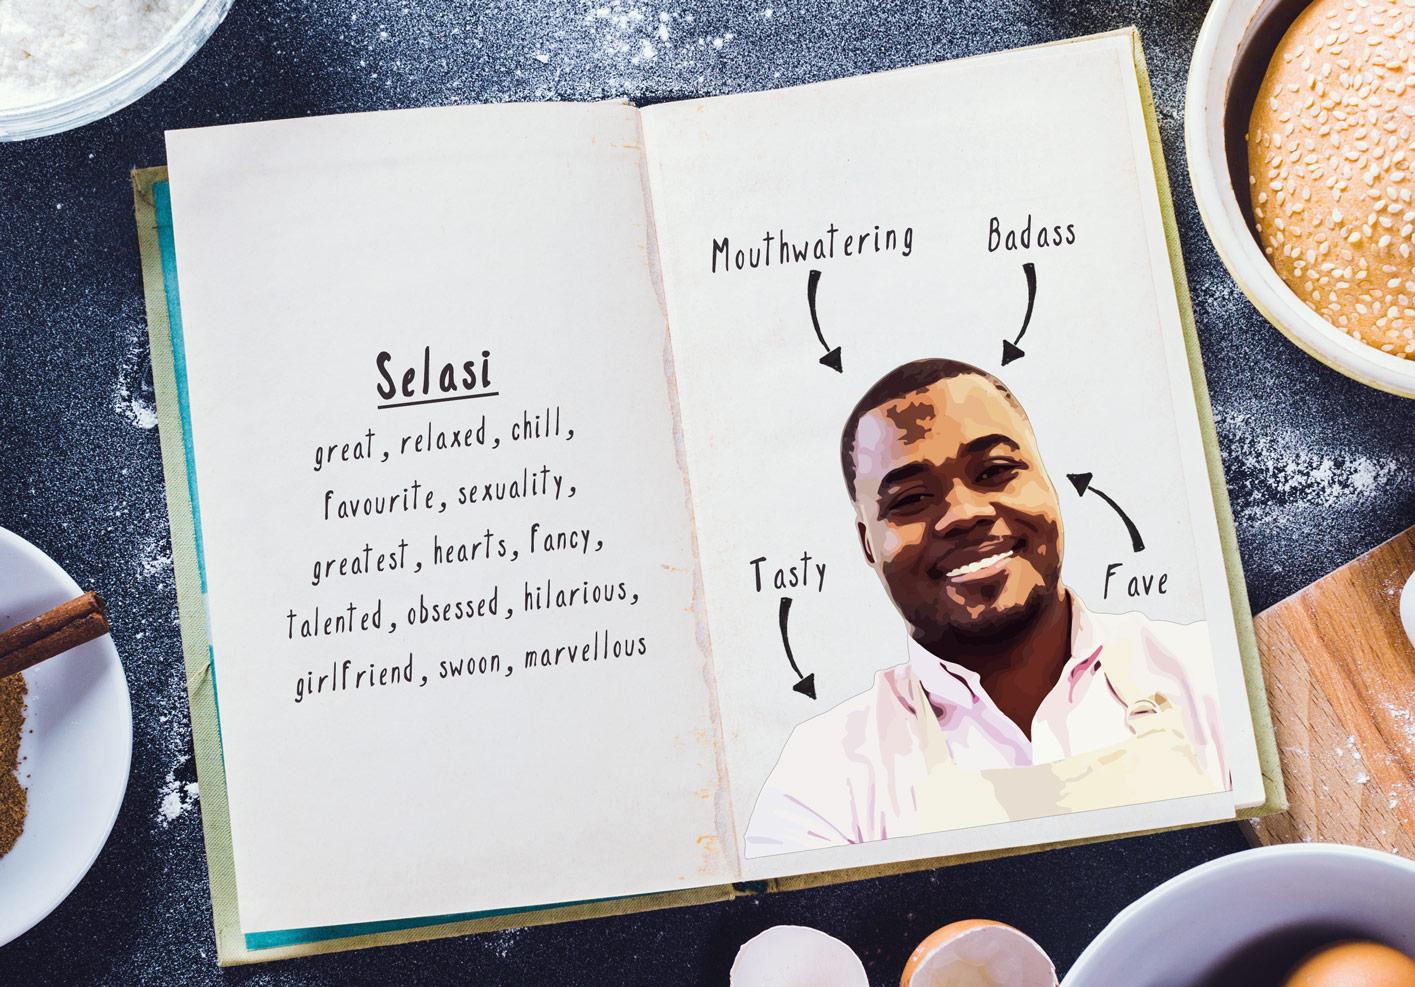 gbbo_book_selasi